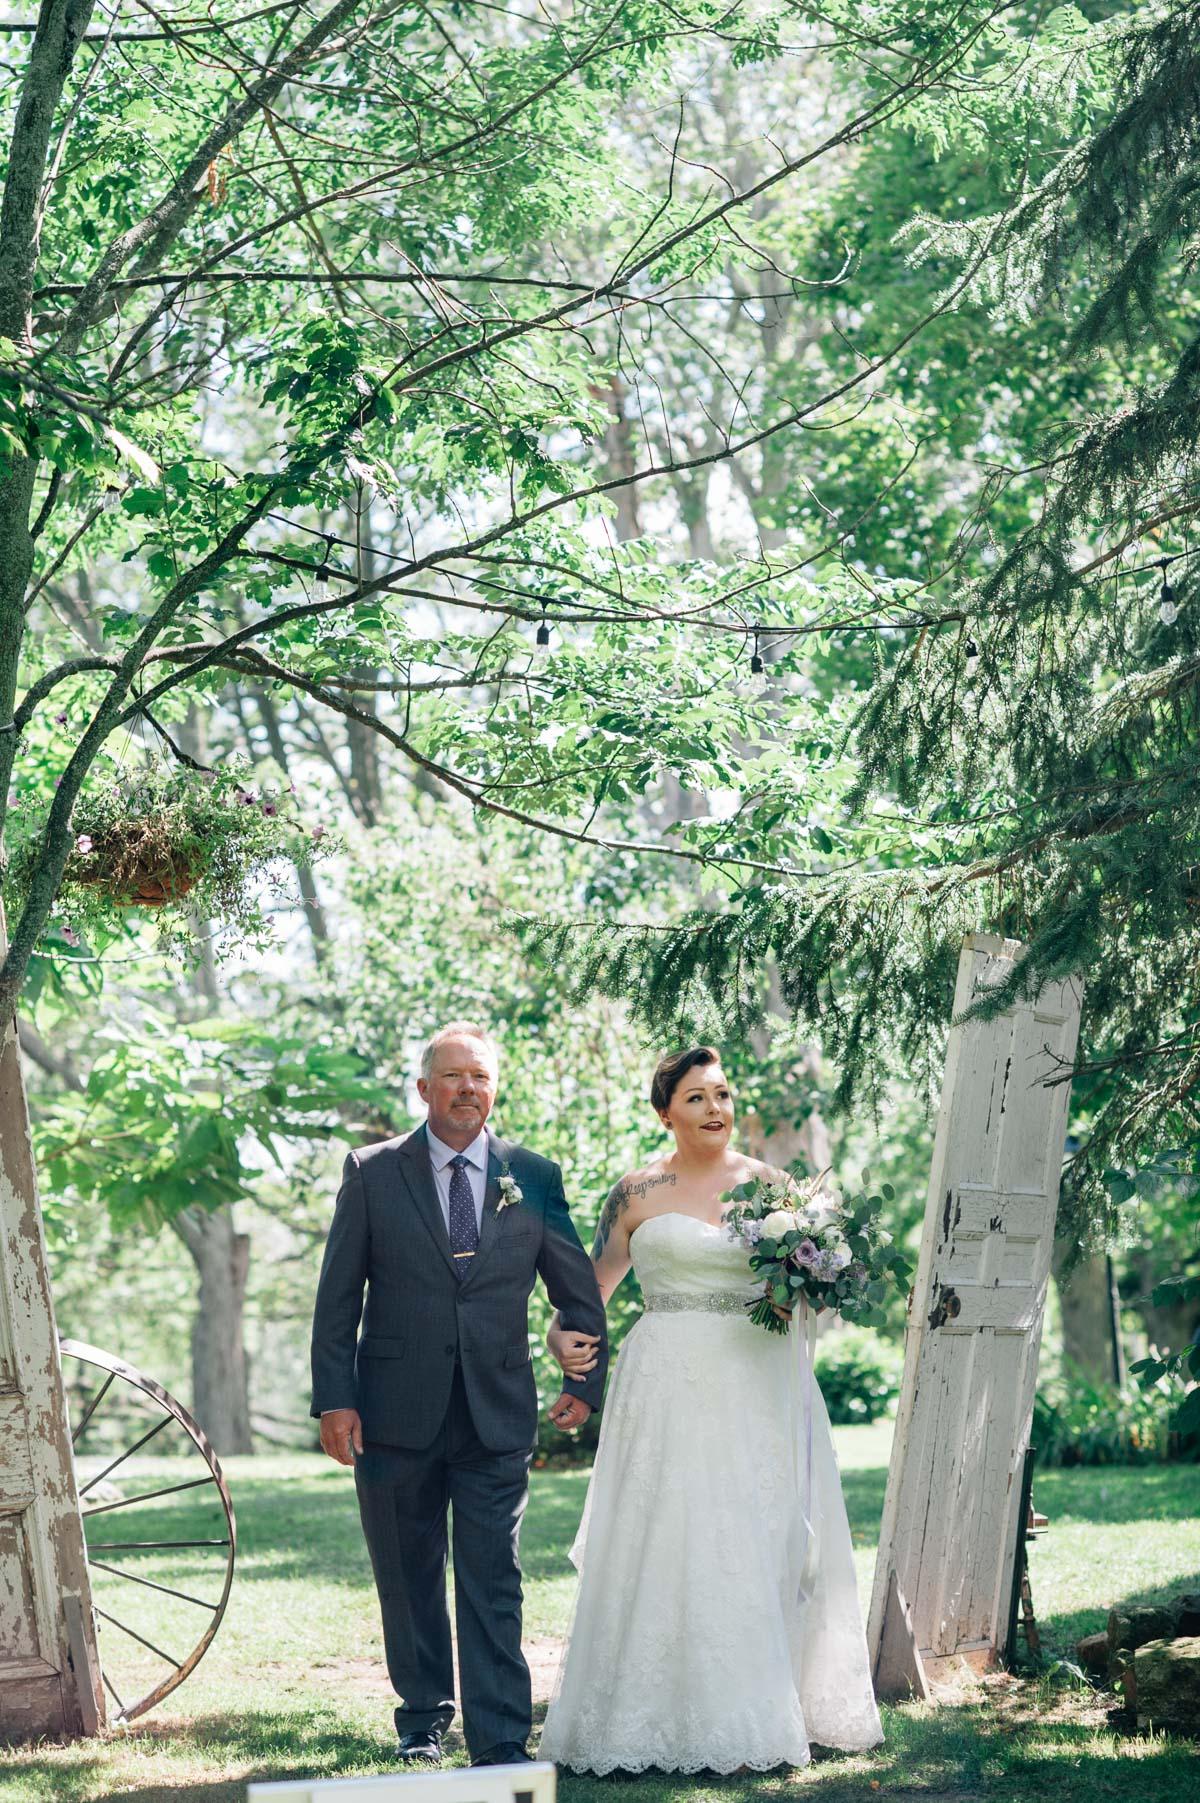 sara-wilde-photography-vineyard-bride-swish-list-beamer-falls-manor-grimsby-wedding-23.jpg